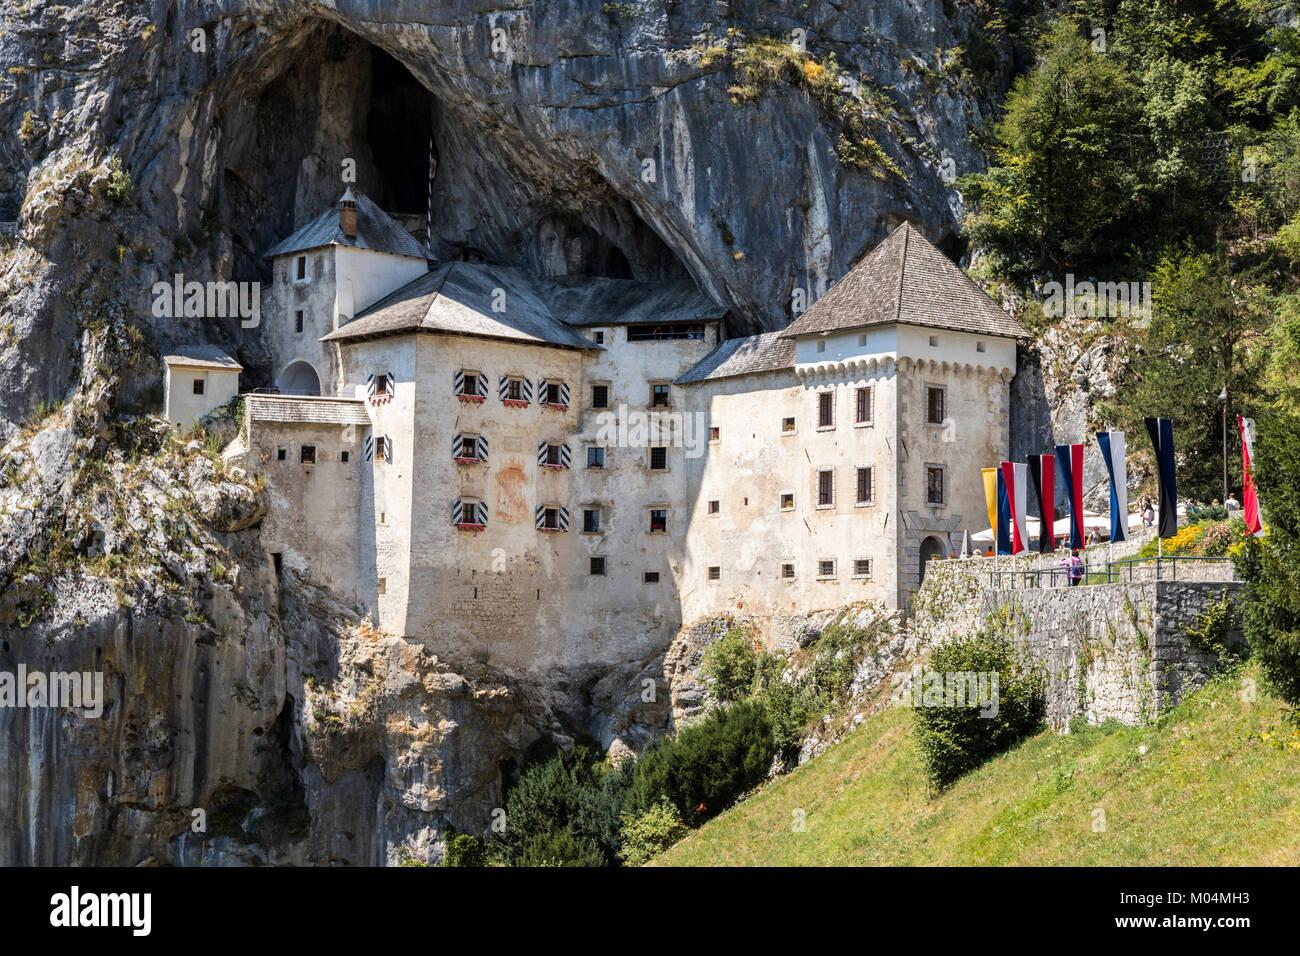 Predjama Castle (Predjamski grad), a Renaissance castle built within a cave mouth in the historical region of Inner - Stock Image